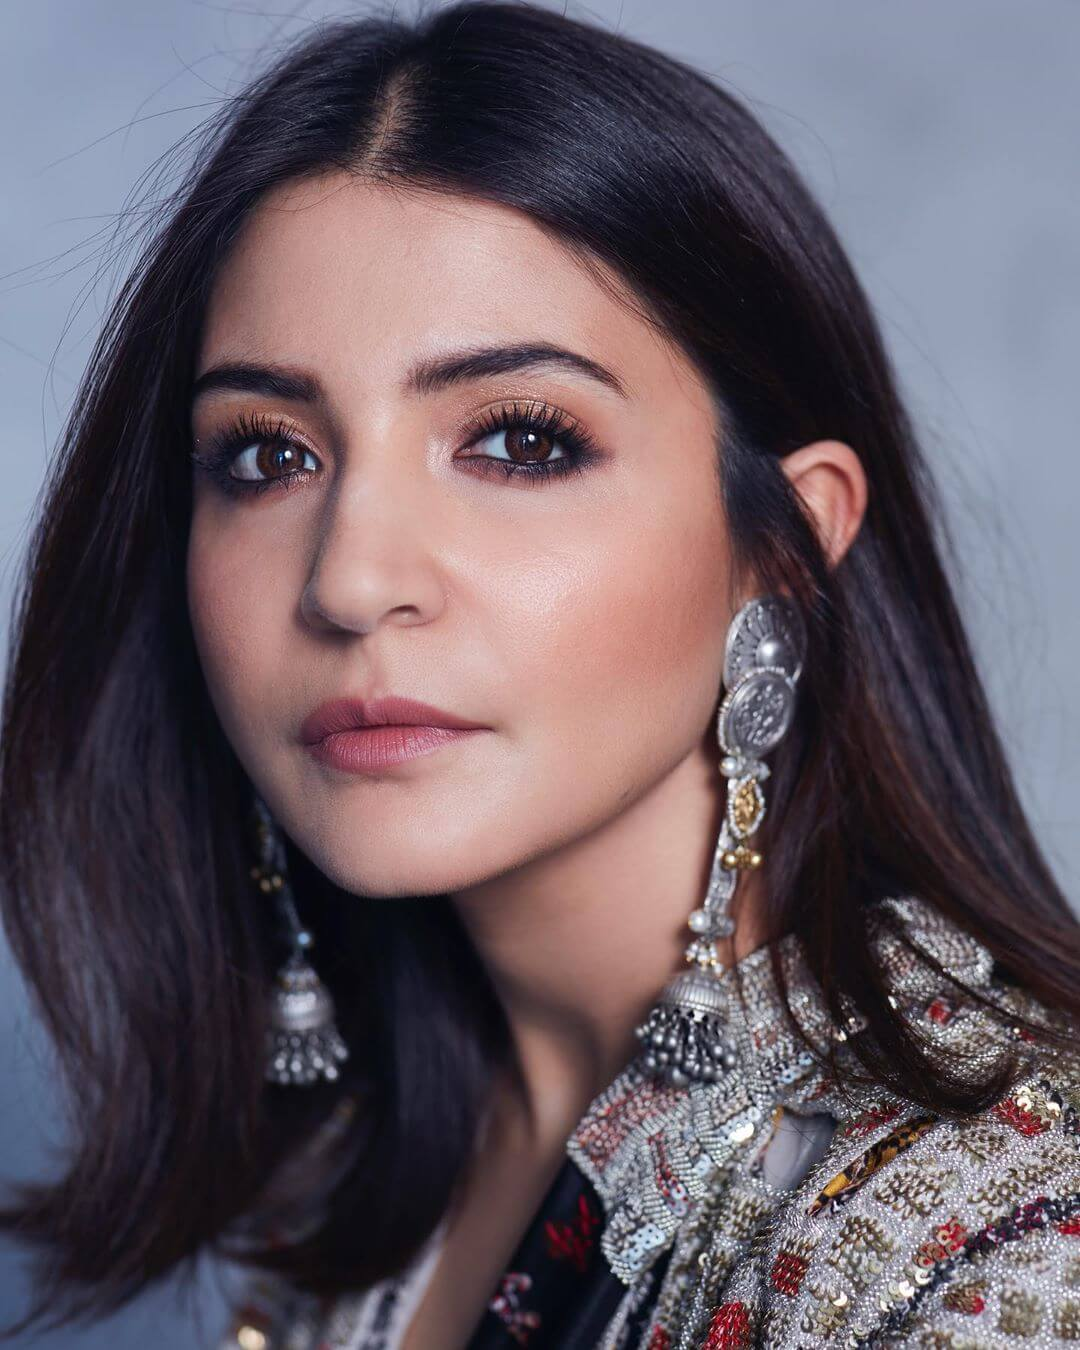 Metal Drop Earrings With Jhumkis Anushka Sharma's Earring Designs